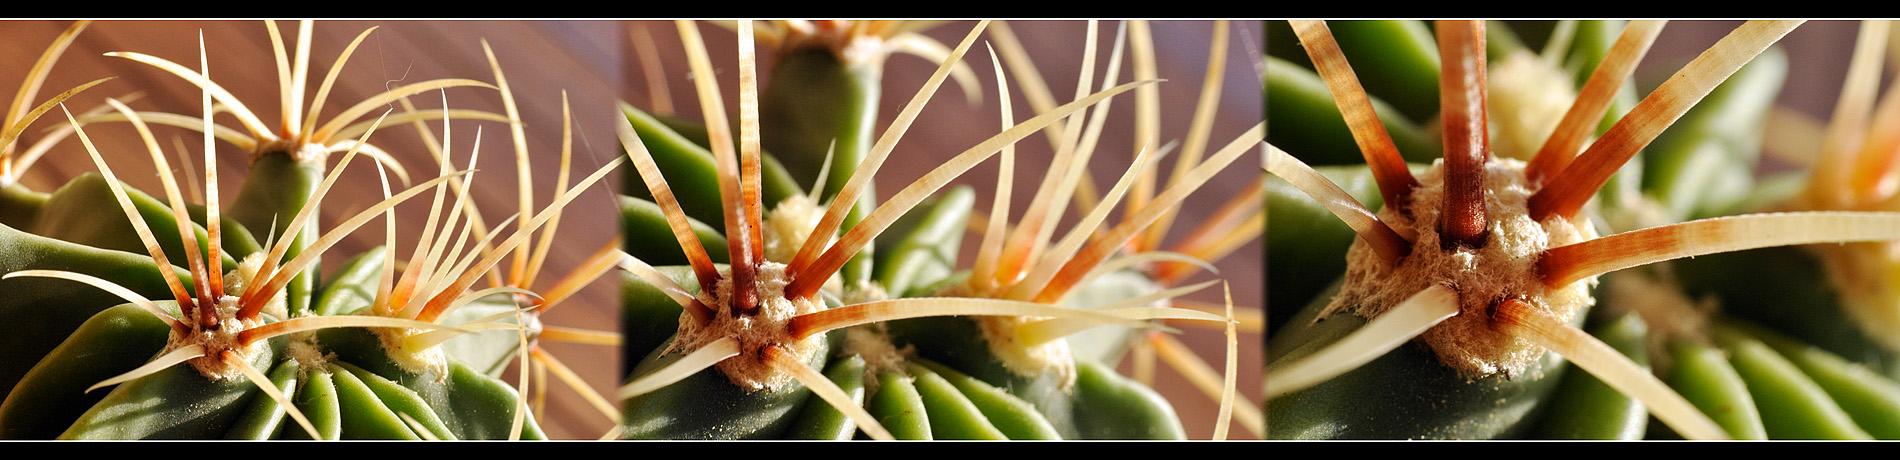 Kaktus Panorama